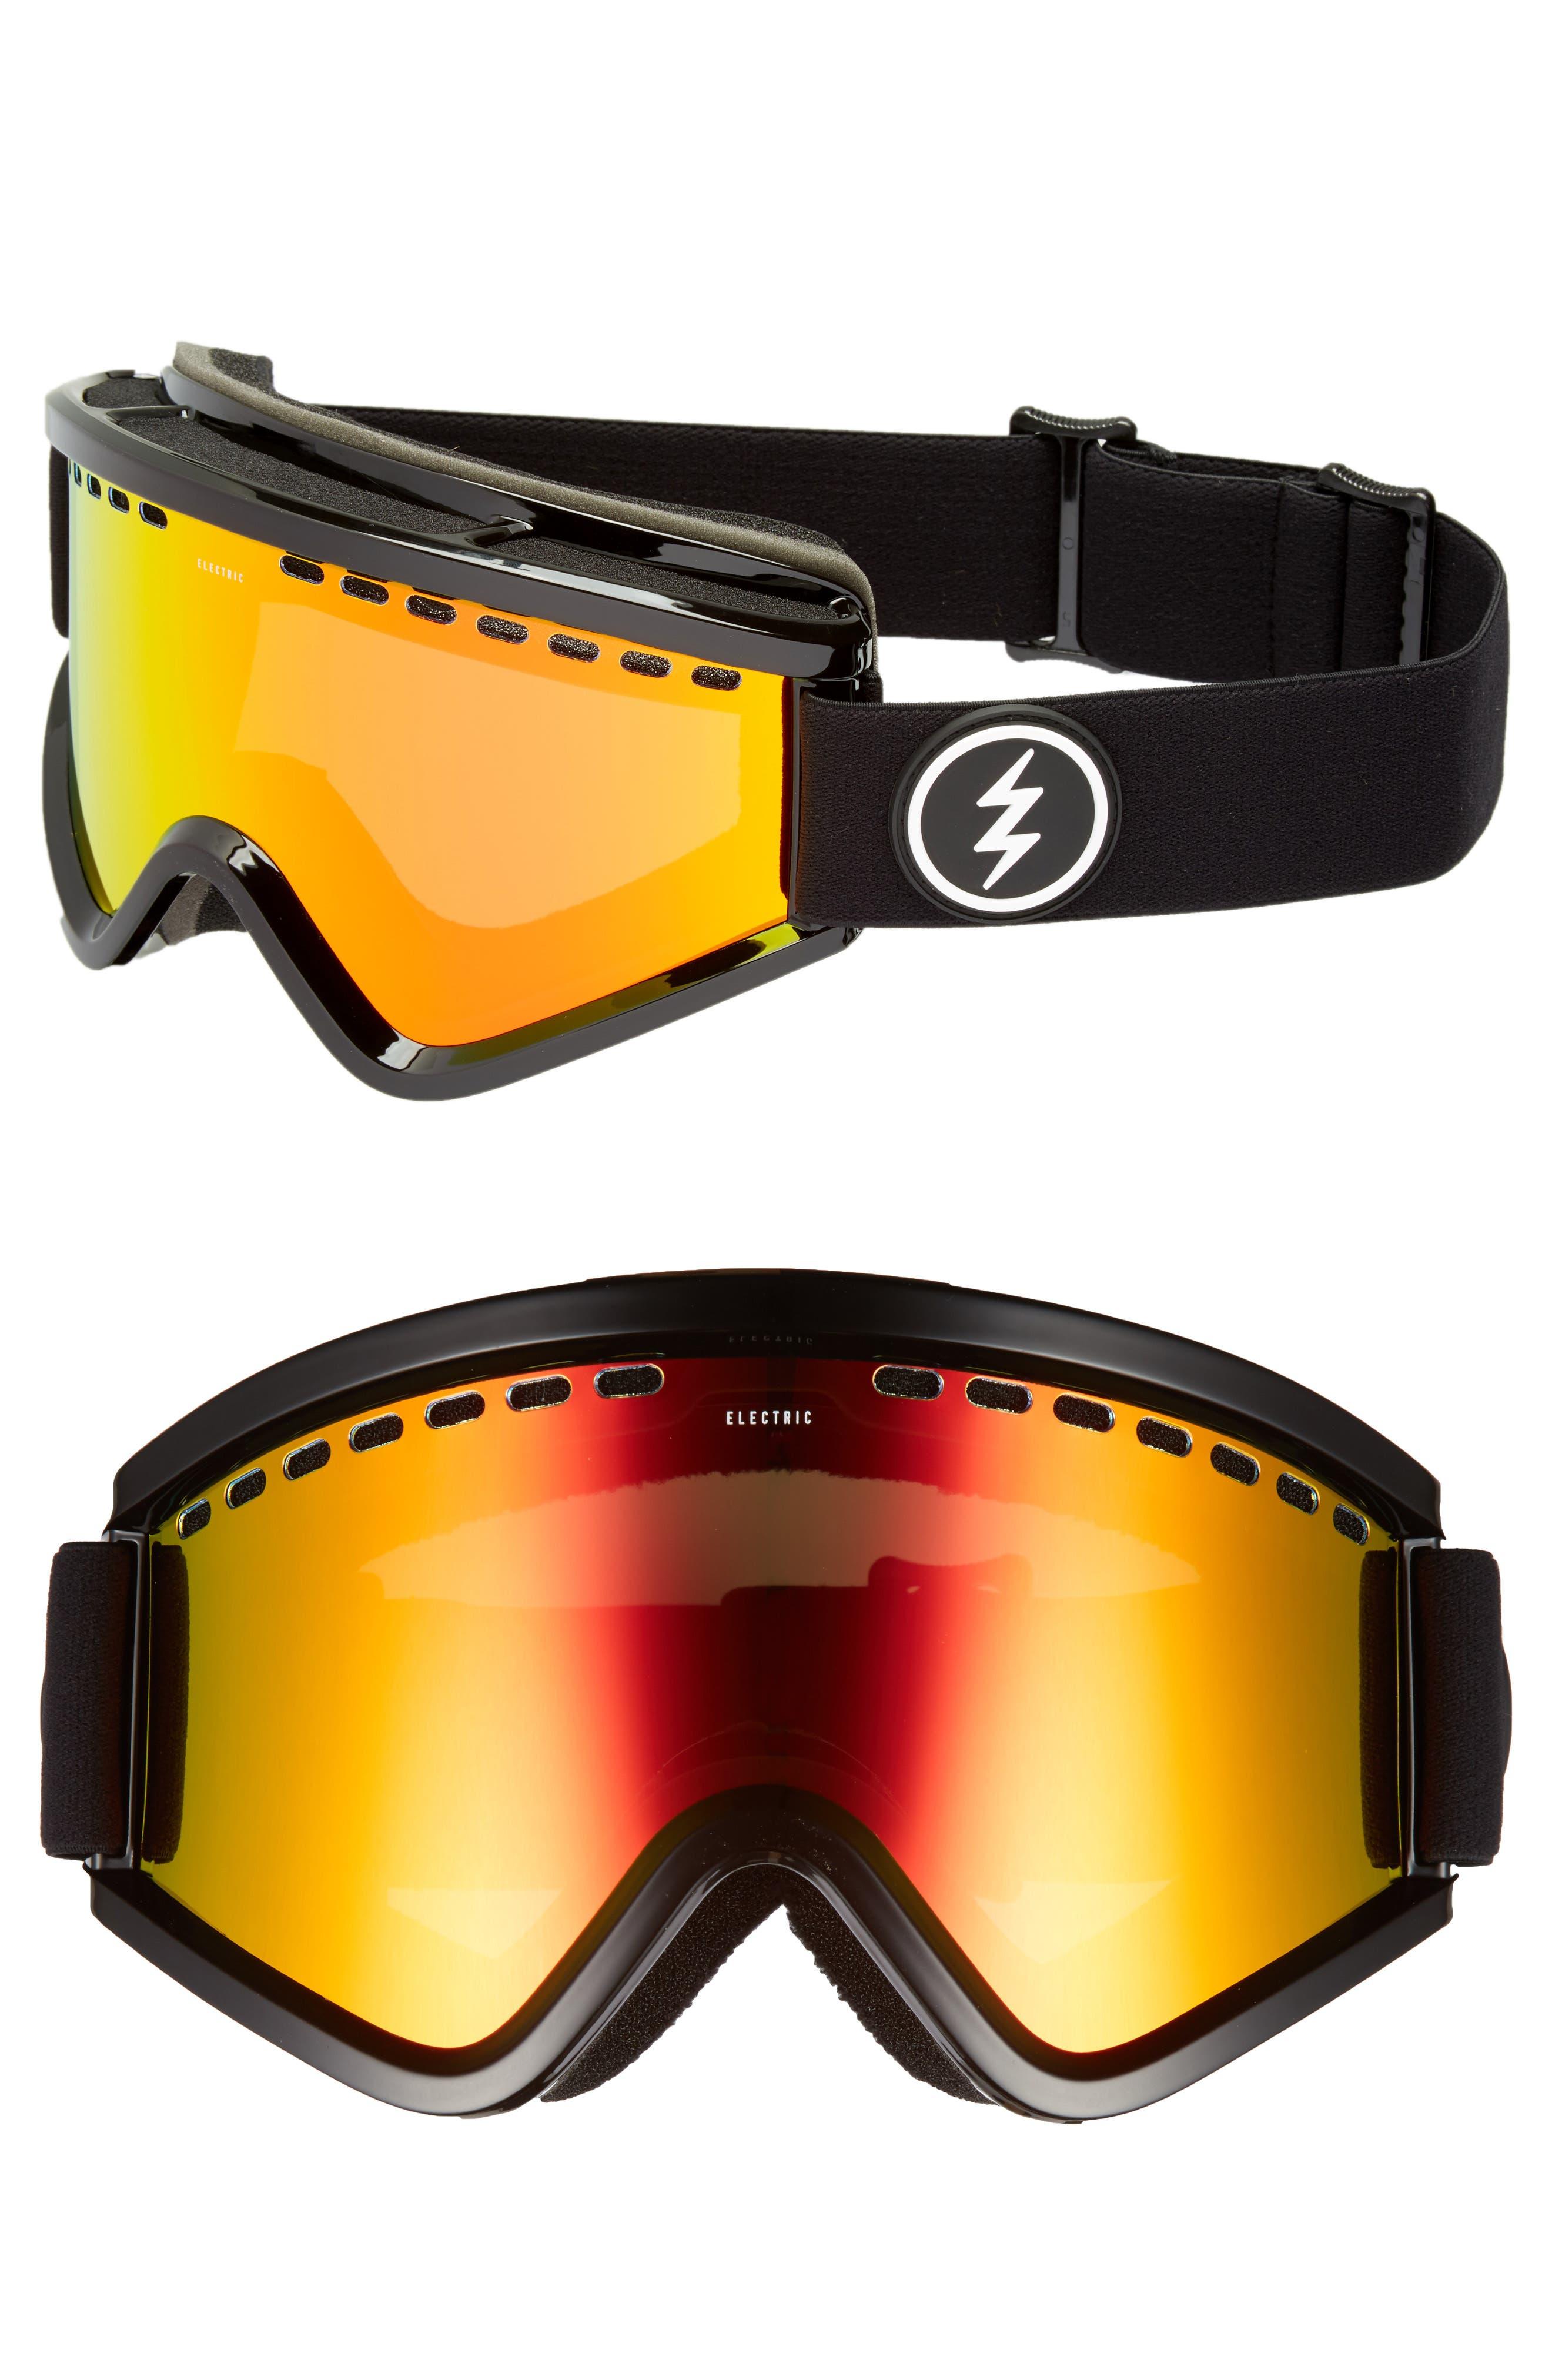 Main Image - ELECTRIC EGV Snow Goggles